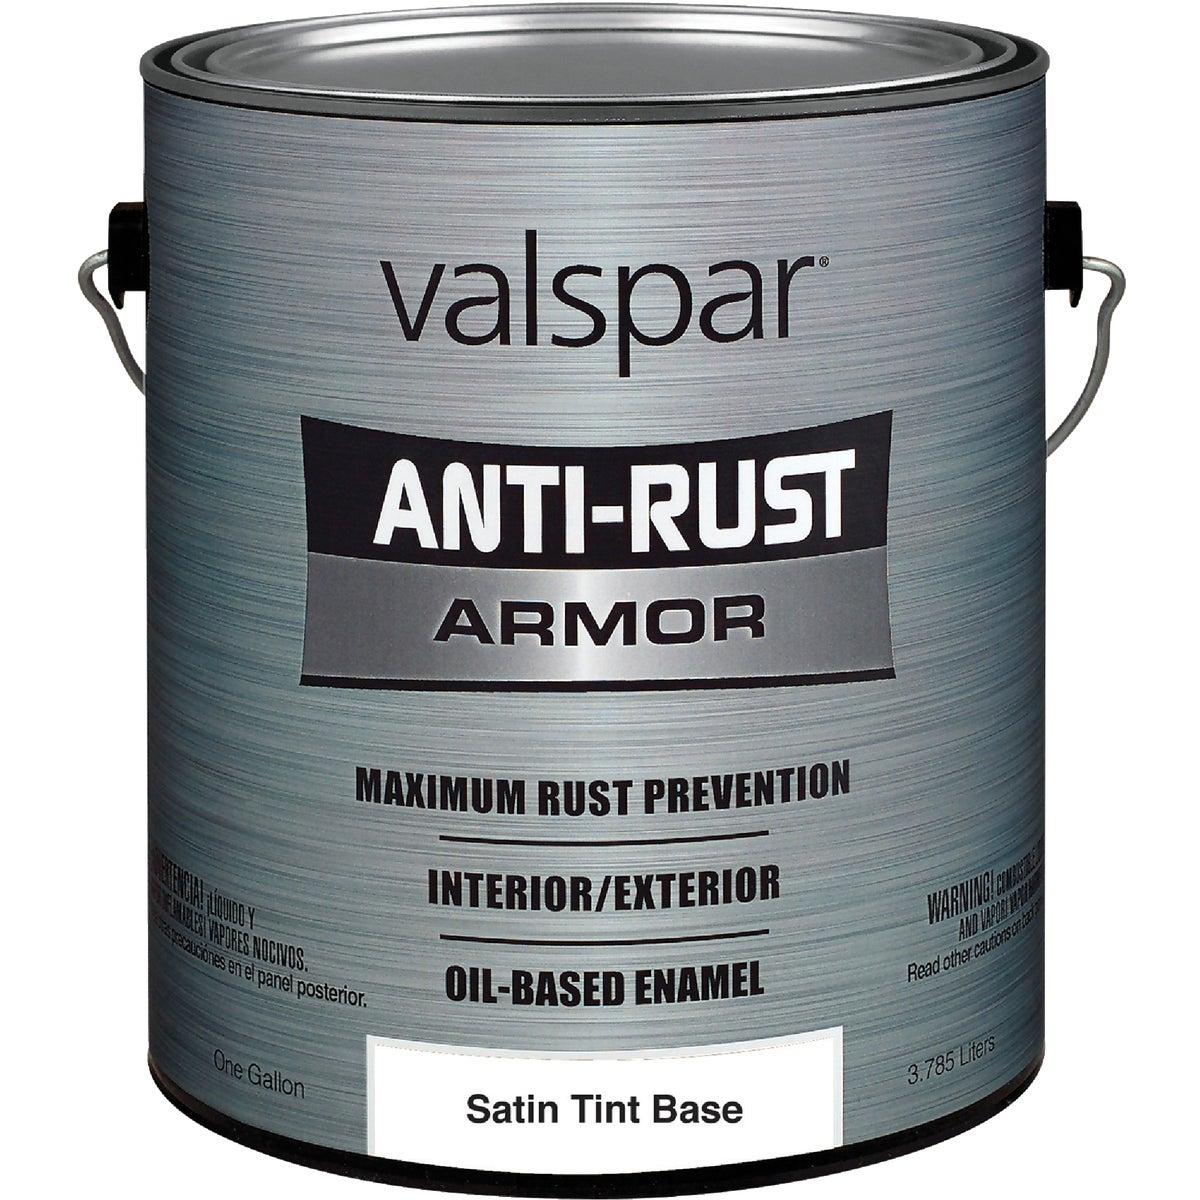 SAT TINT BS RUST ENAMEL - 044.0021882.007 by Valspar Corp